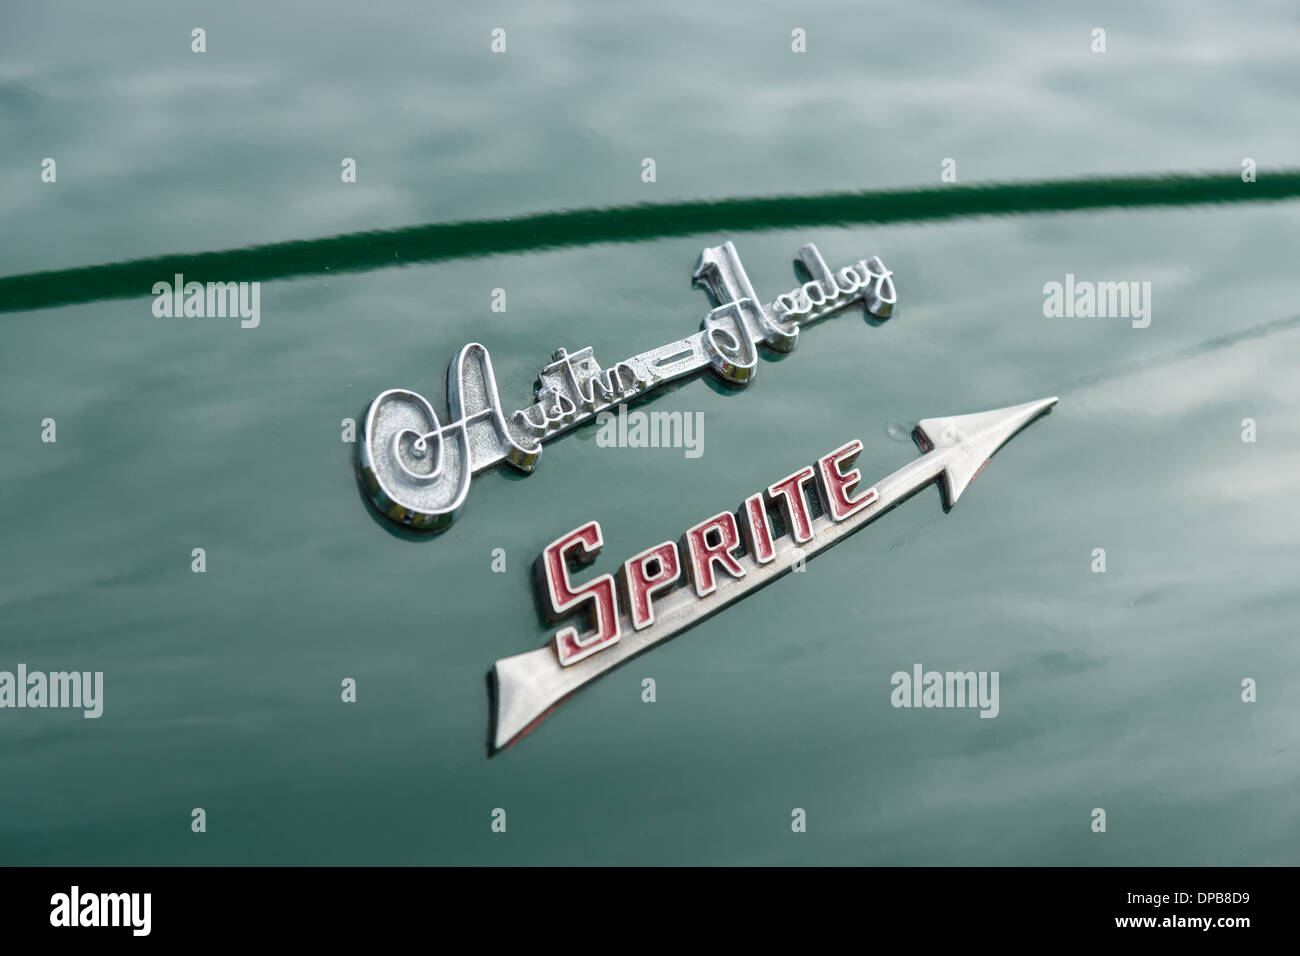 Emblem Sports Car Austin Healey Sprite Stock Photo 65401653 Alamy